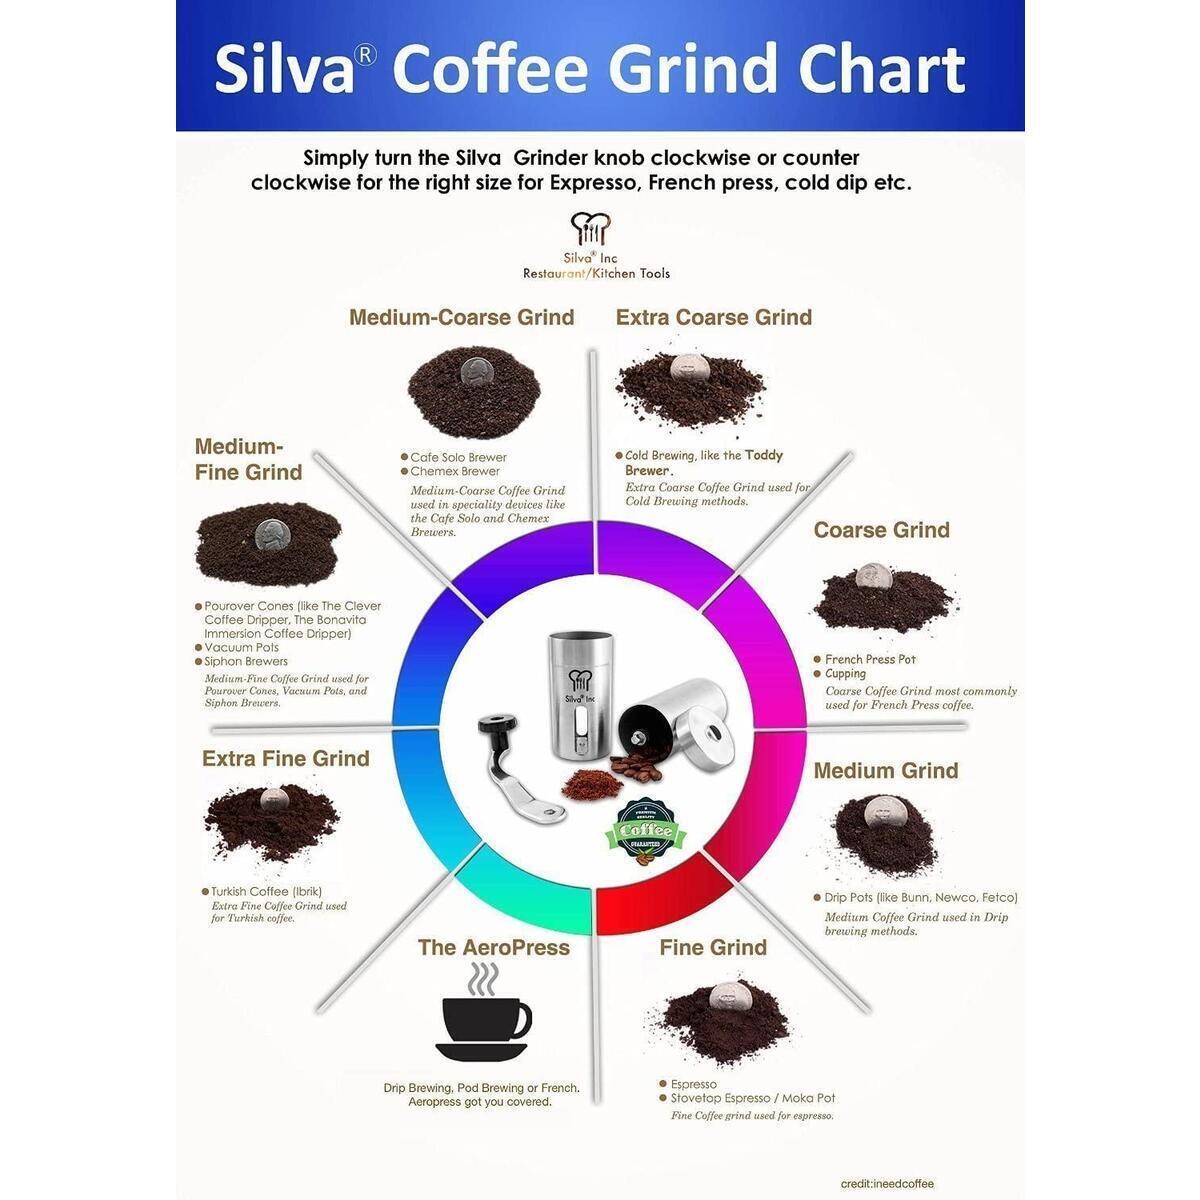 Silva Manual Coffee Grinder - Hand Coffee Bean Grinder | Ceramic Burr Coffee Mill for French Press, Espresso, Turkish, Aeropress - Brushed Stainless Steel - Bonus Scoop